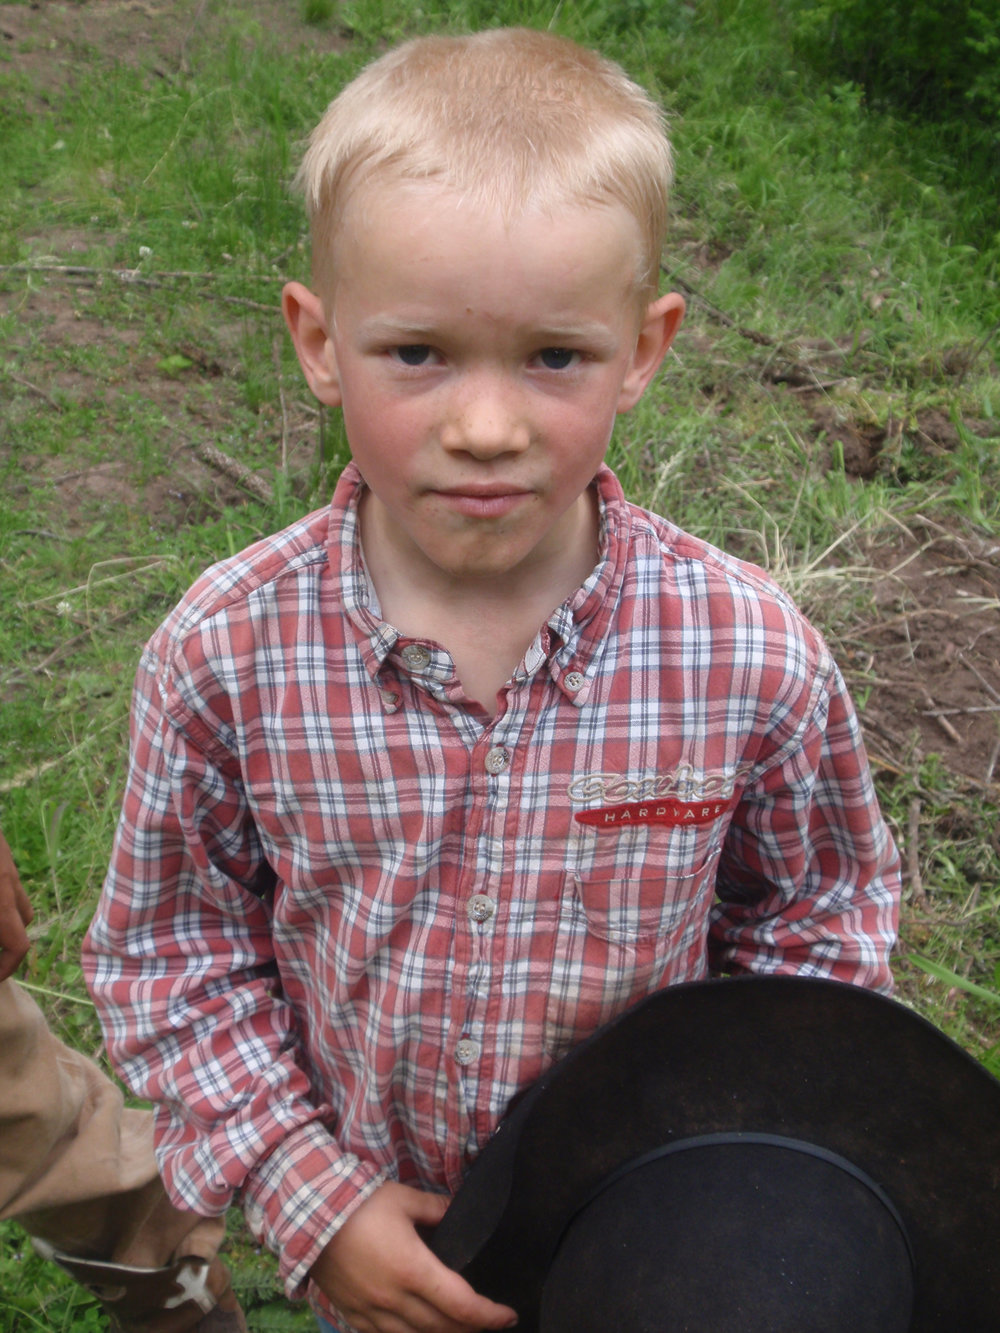 grass-fed-beef-familyP6280230.jpg